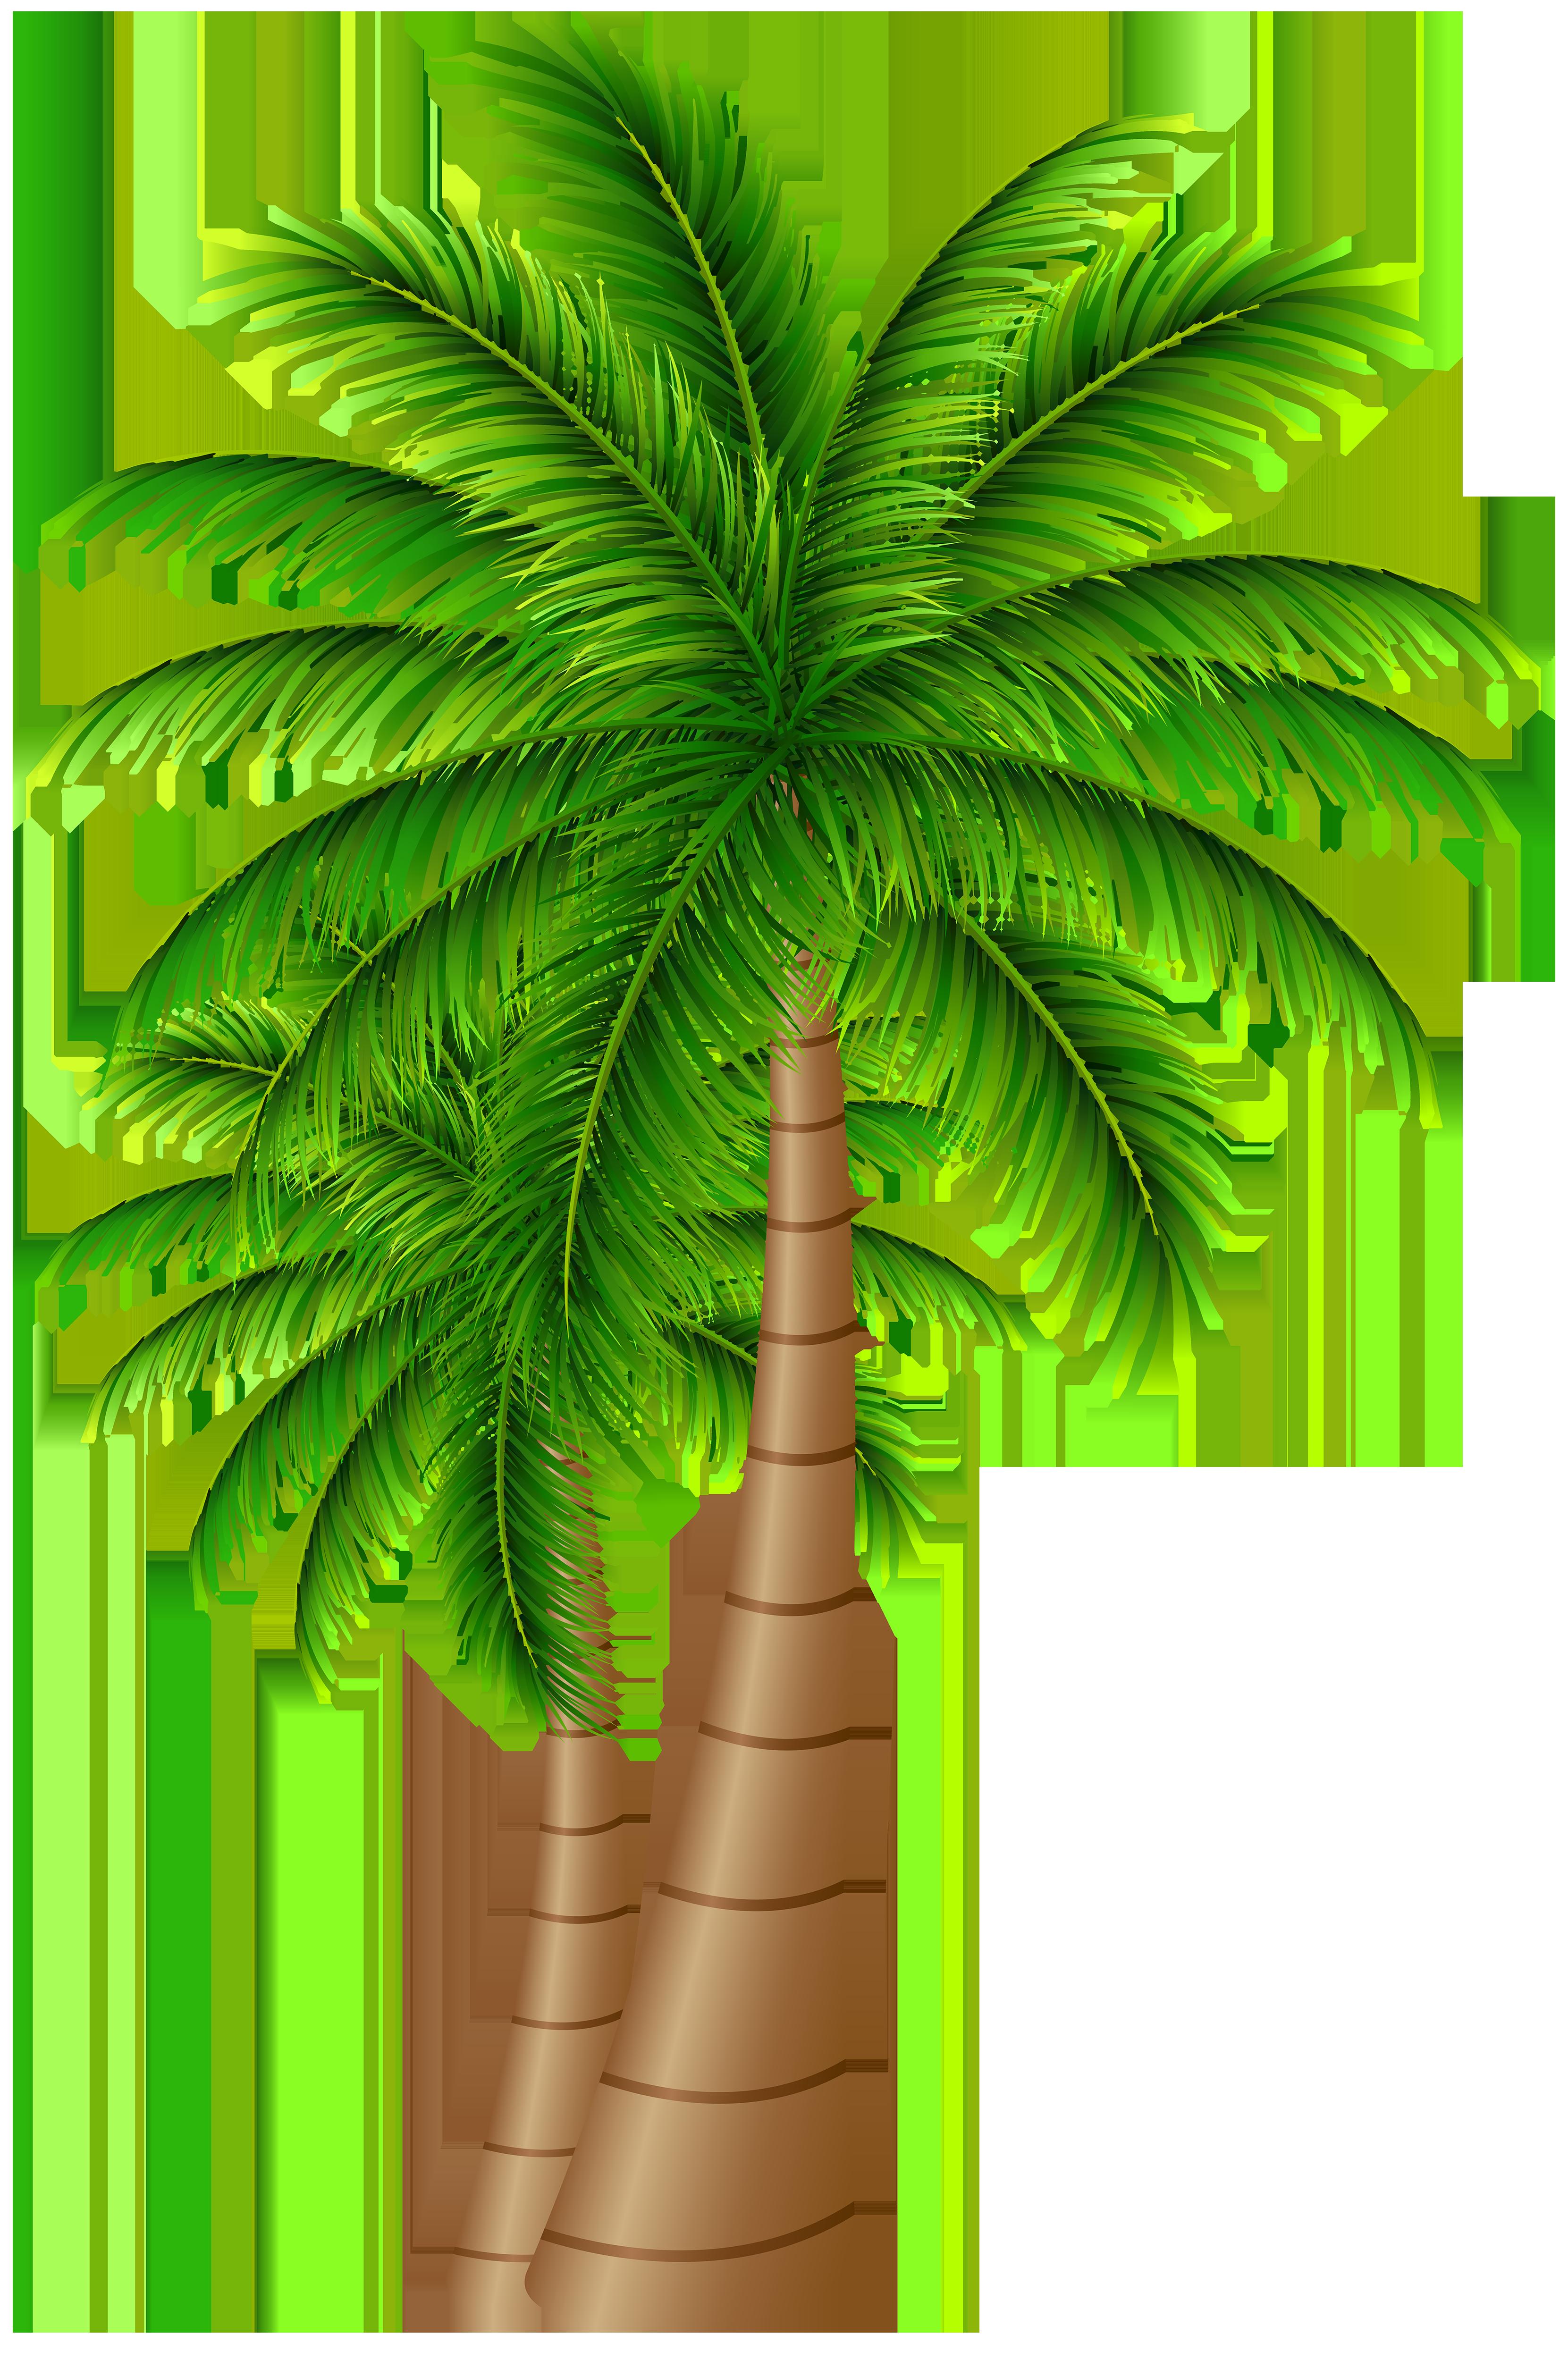 Clipart png palm tree, Clipart png palm tree Transparent ...